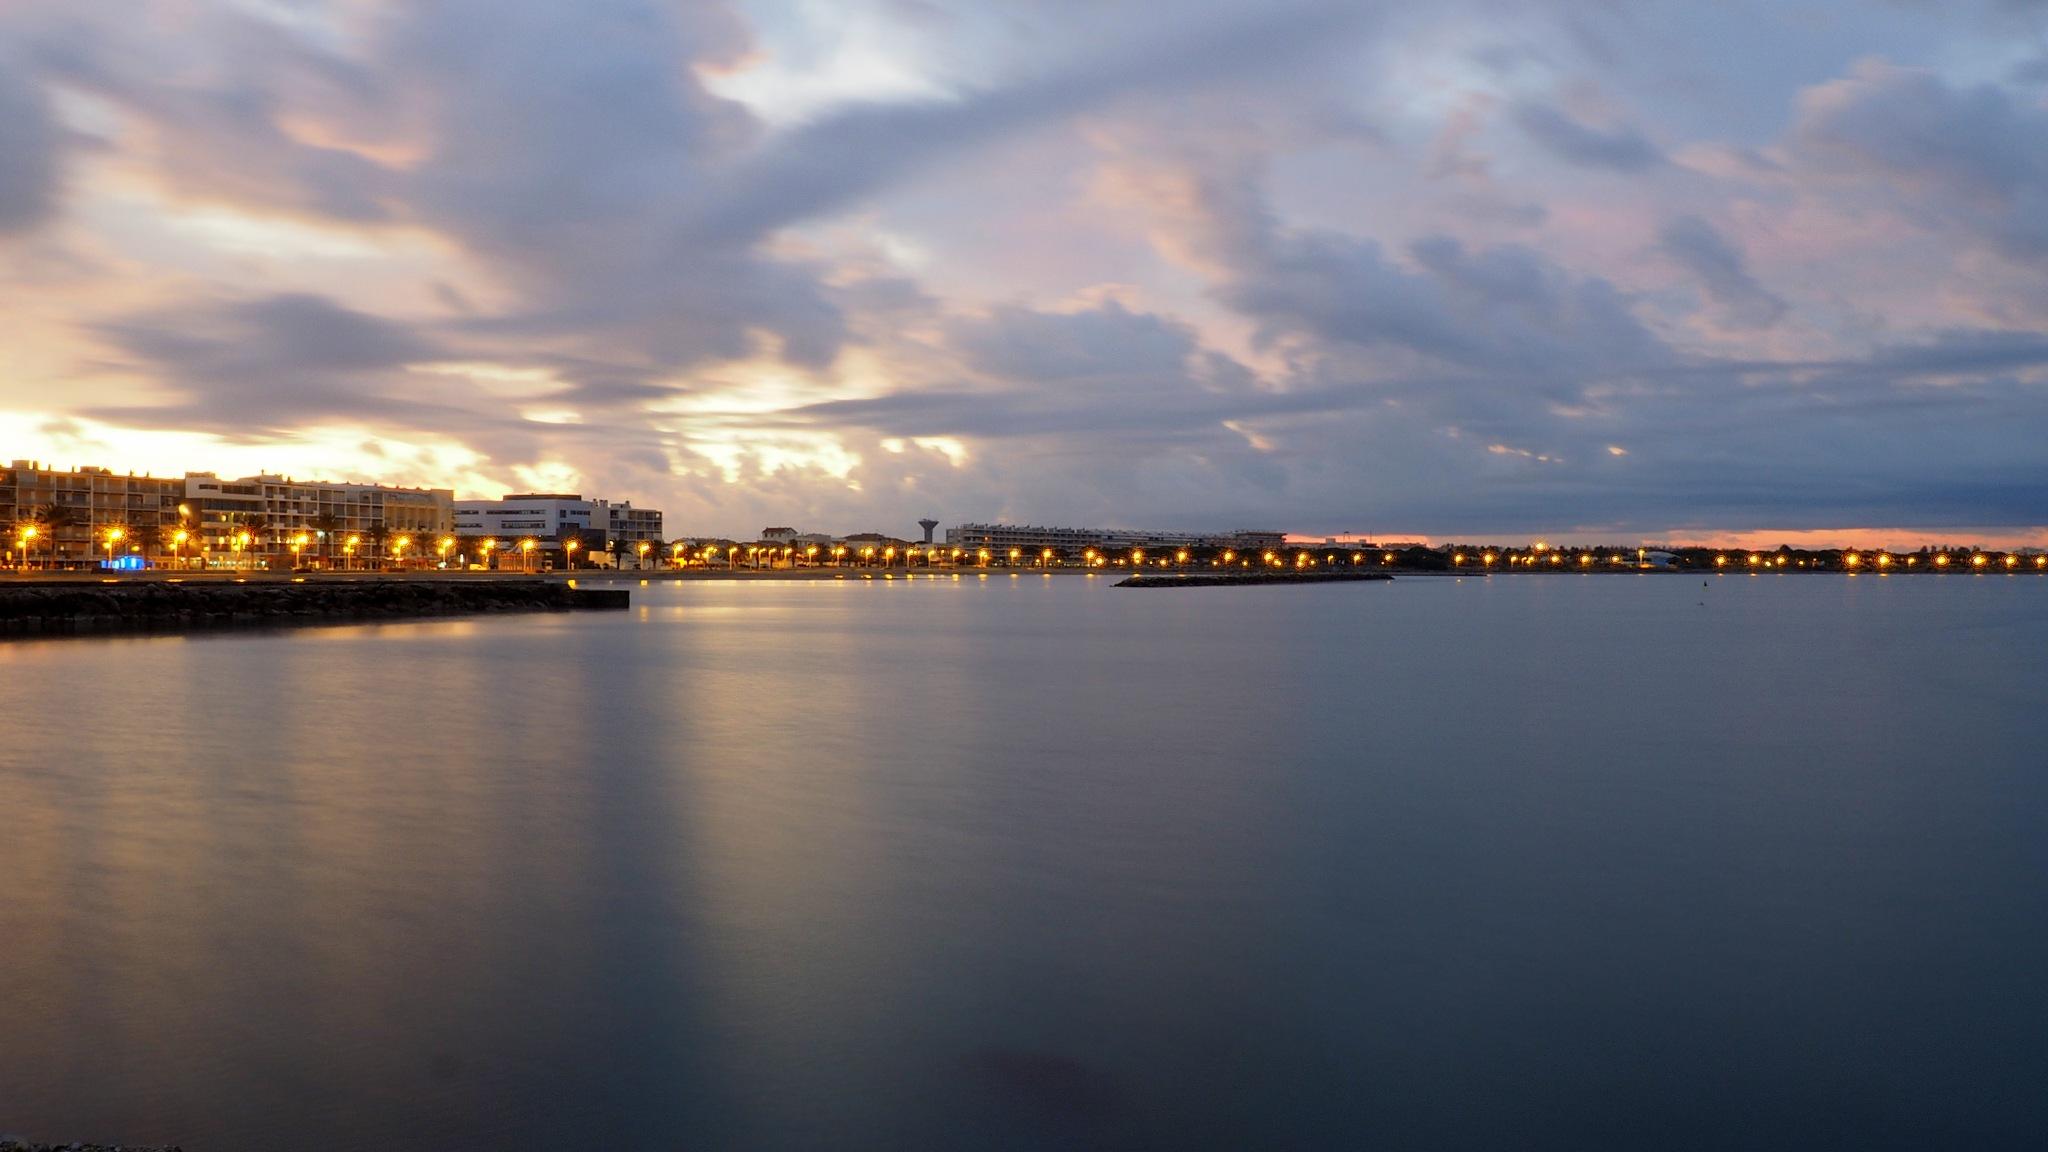 sunrise by alain michel